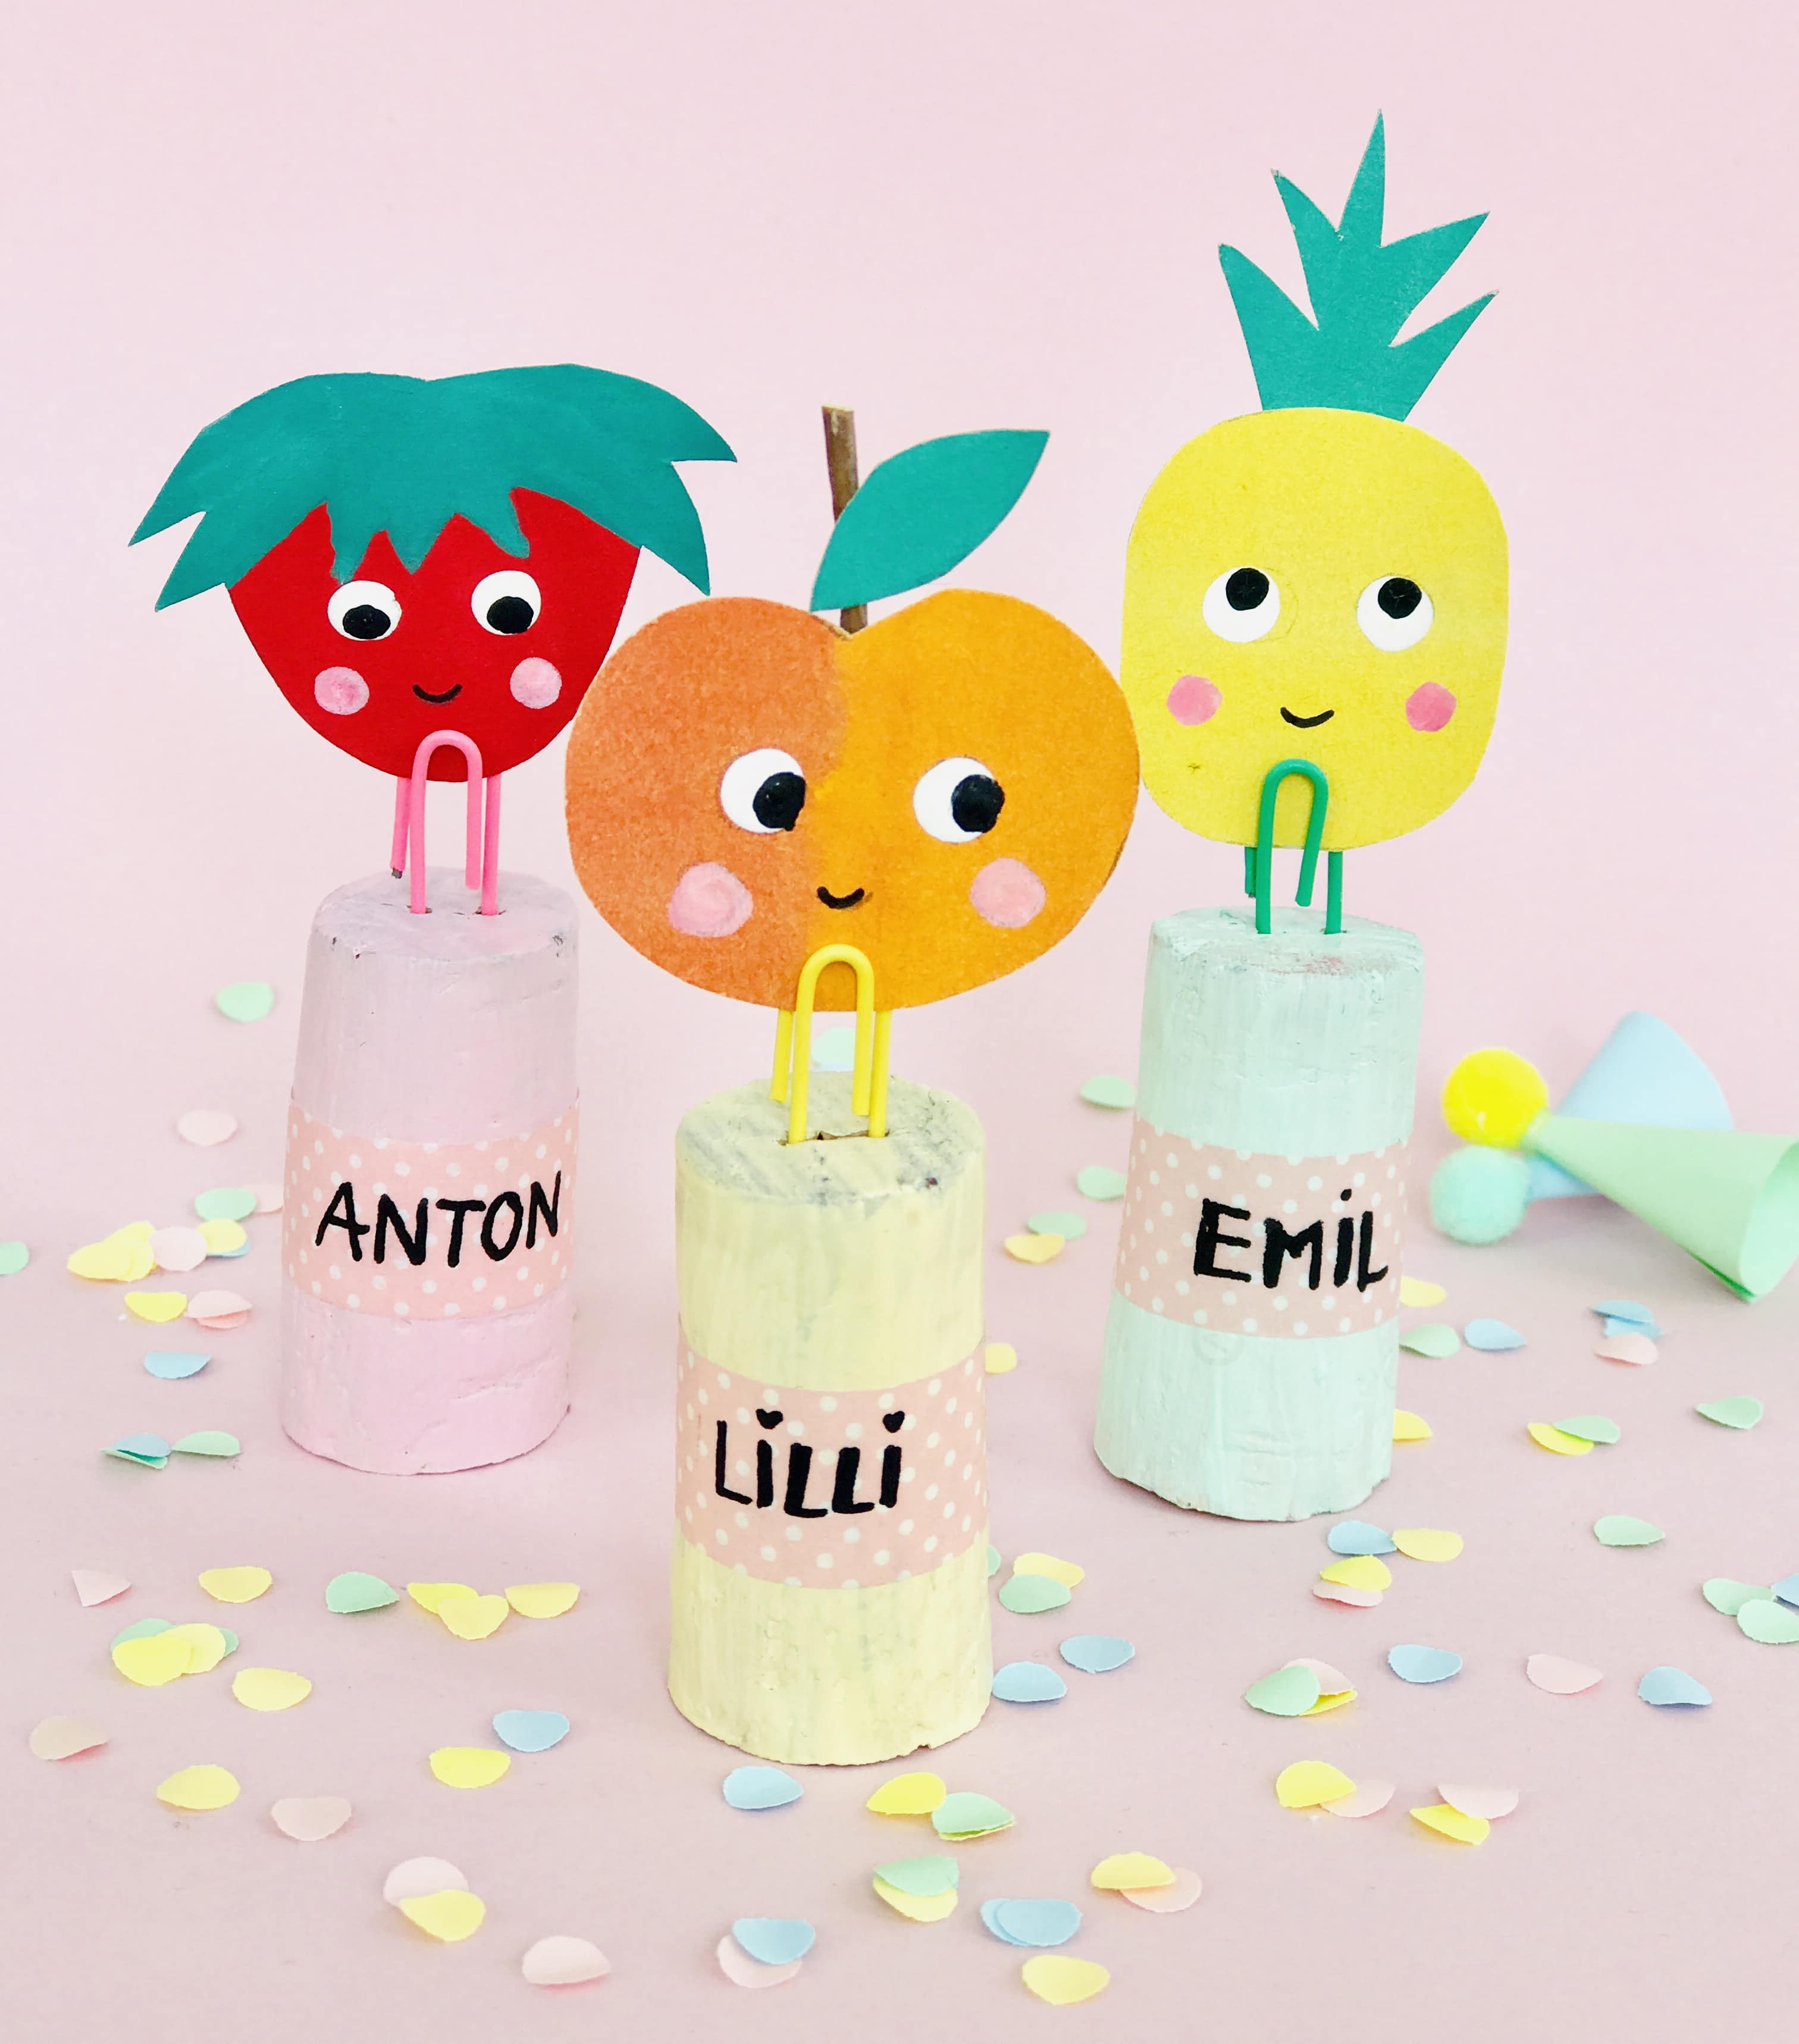 Nachhaltige Mitgebsel, Tutti Frutti Party, Partydeko, Mitgebsel, basteln, Upcycling Kinder